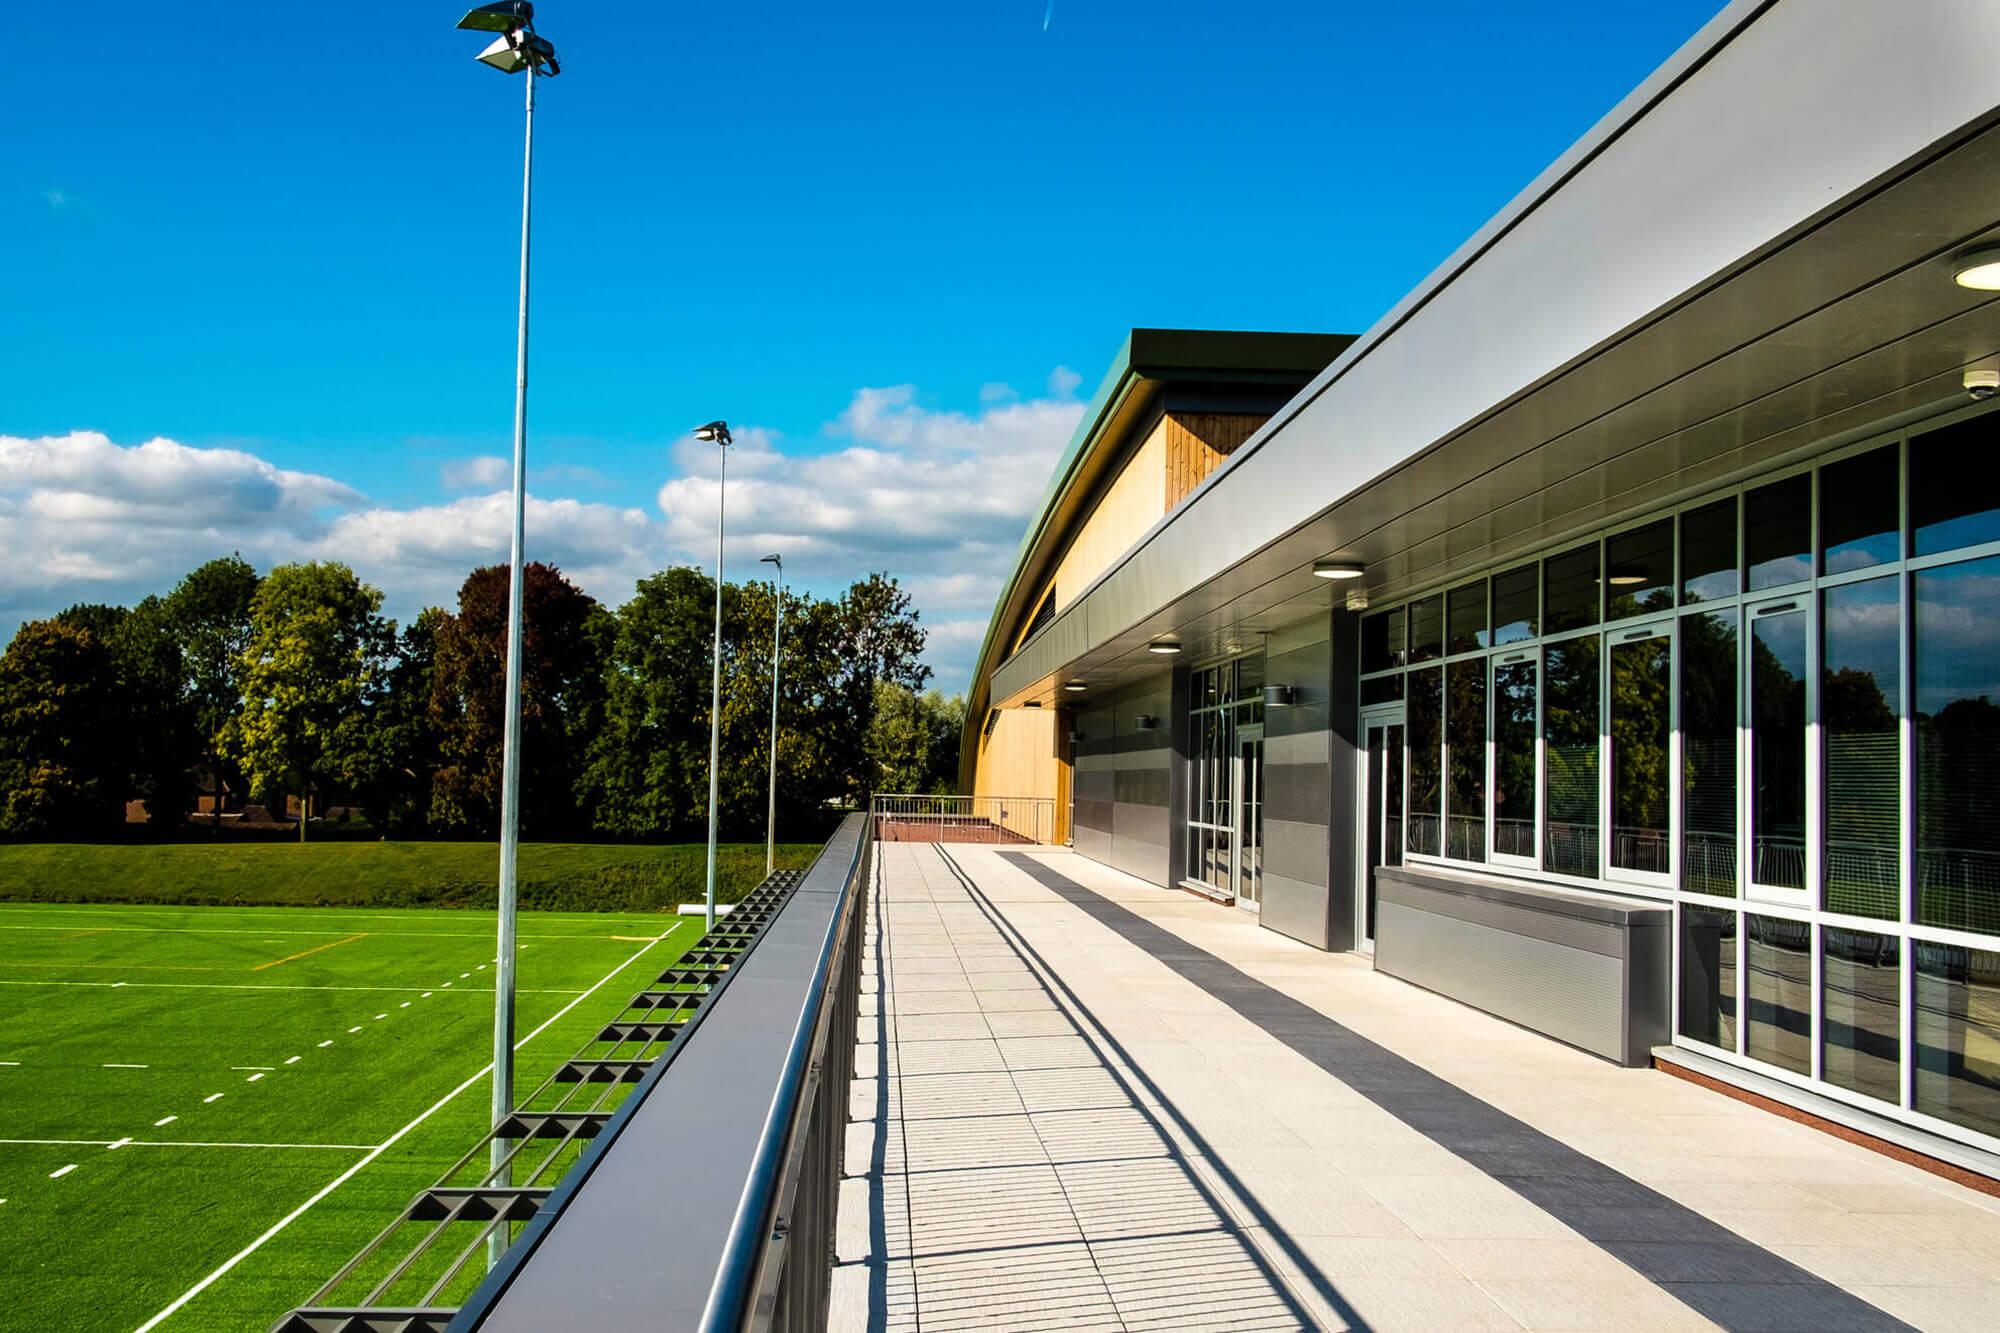 University of Derby Open Day September 2015